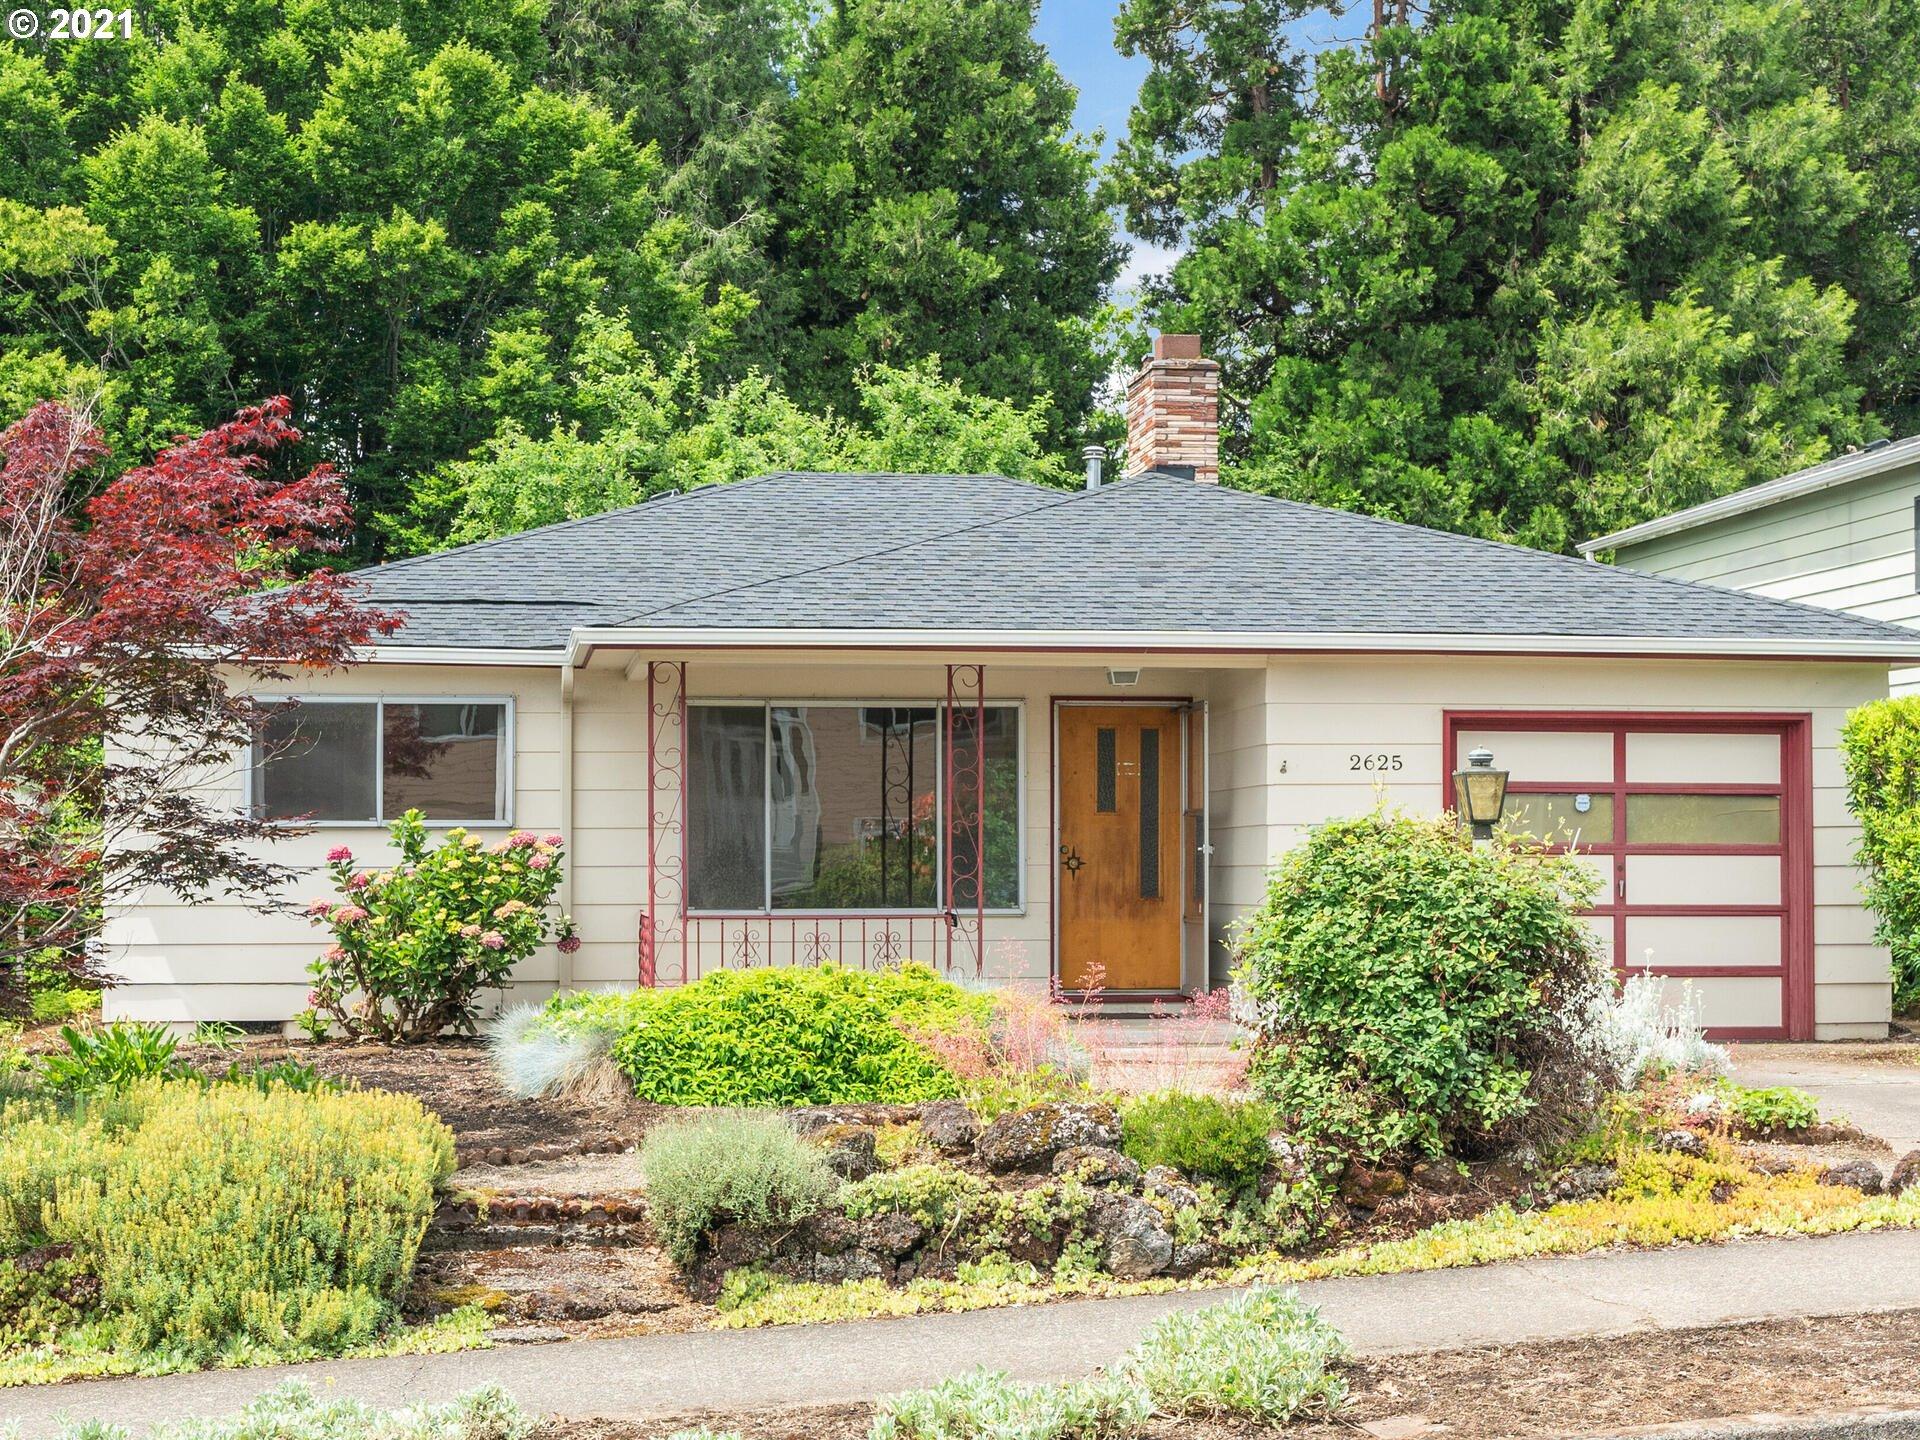 2625 SE 73RD AVE, Portland OR 97206